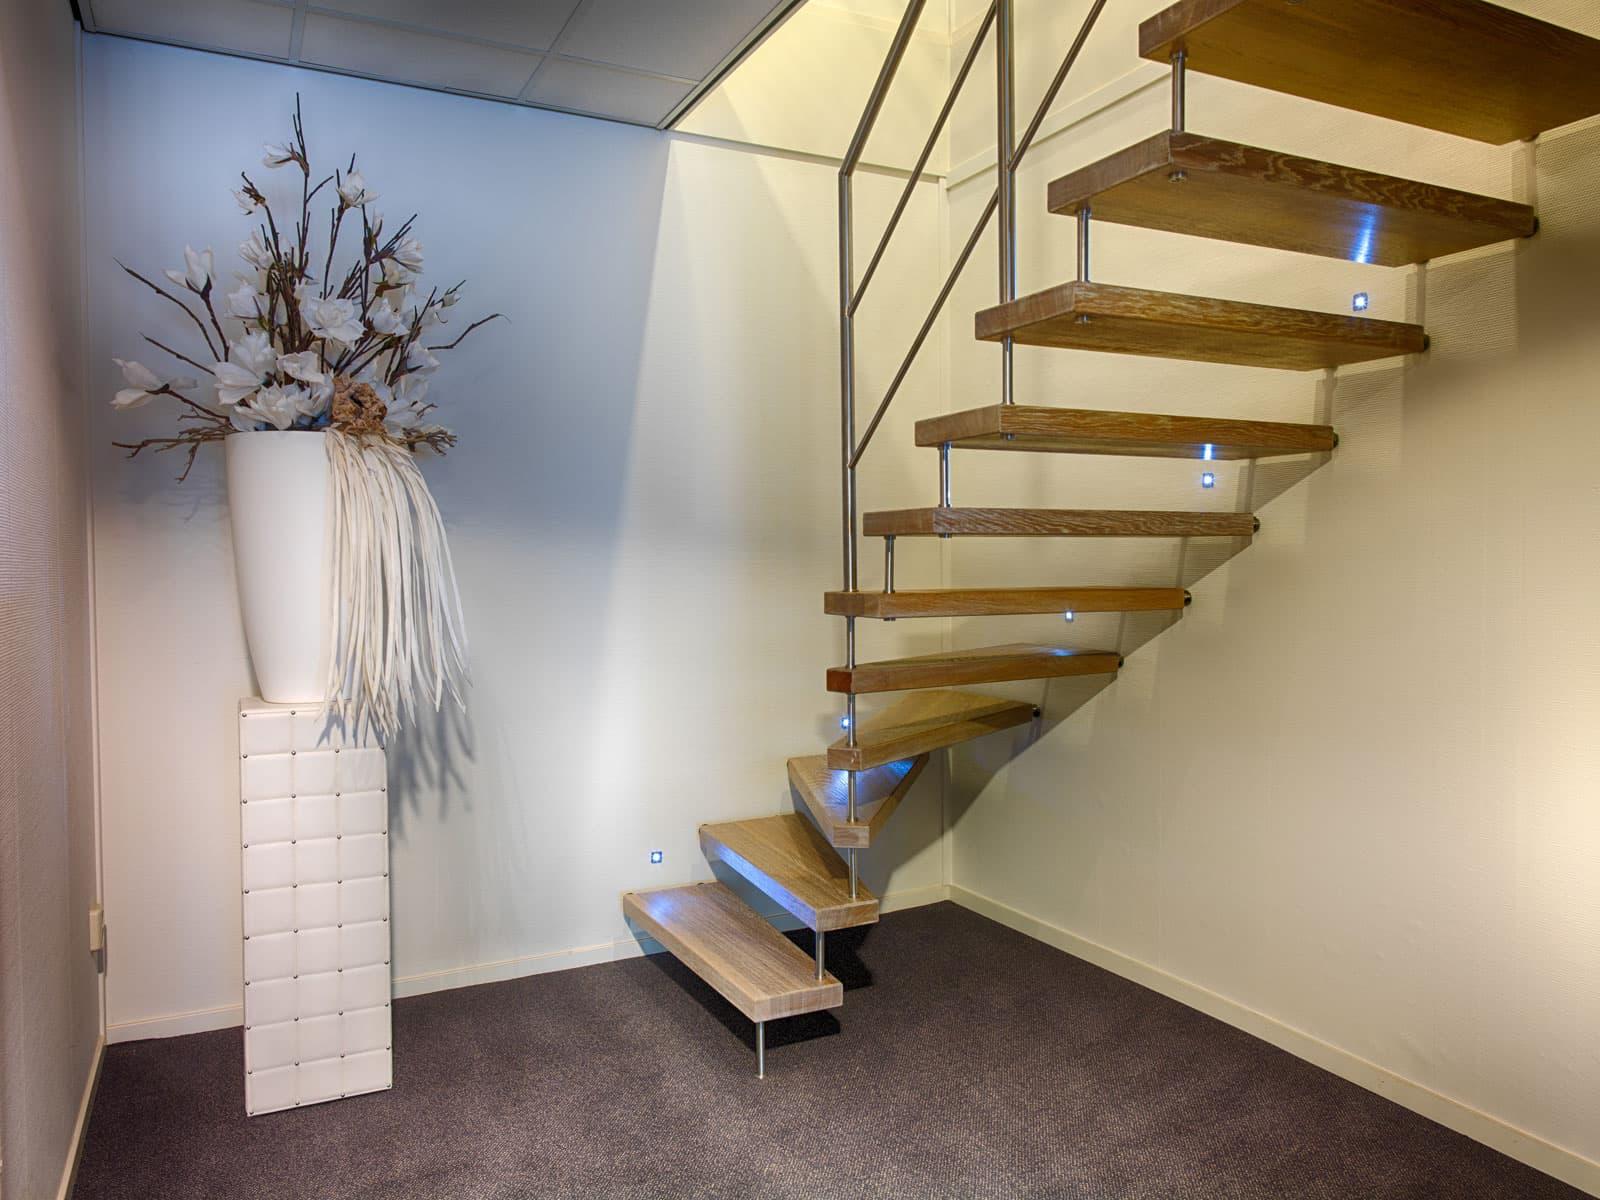 vt03a vrijdragende trap met LED verlichting